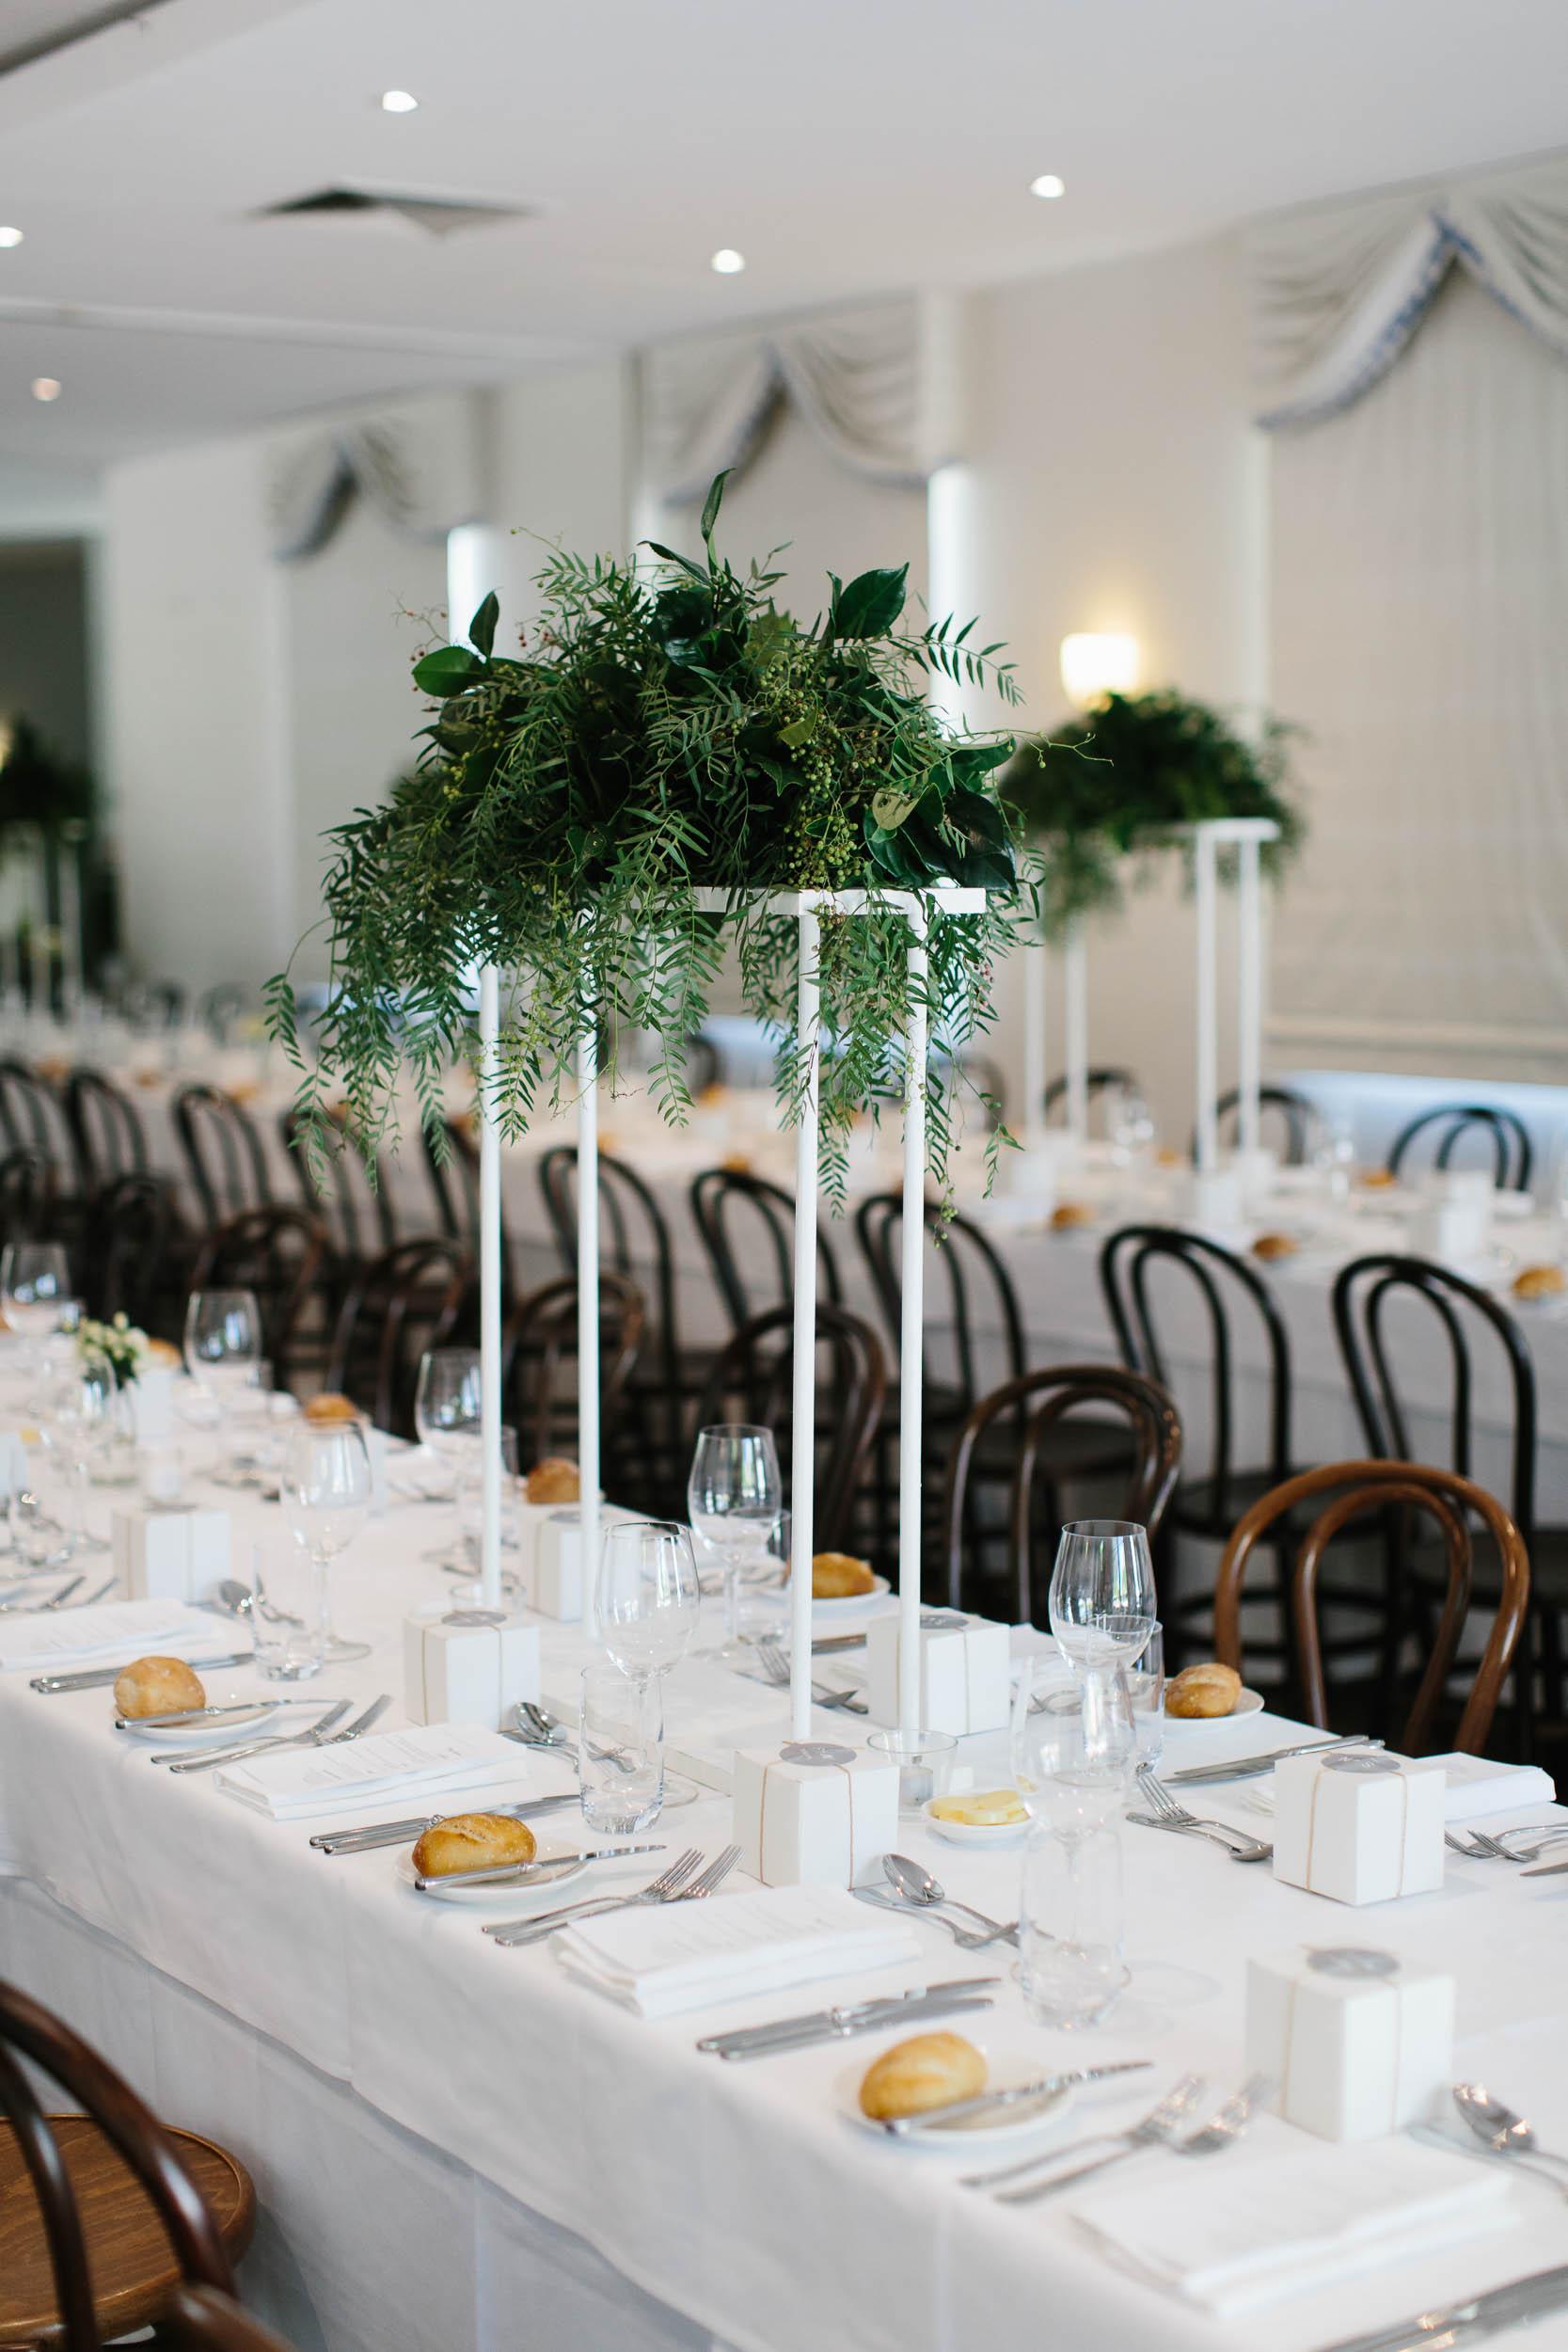 Kas-Richards-Mornington-Peninsula-Wedding-Lindenderry-Red-Hill-139.jpg